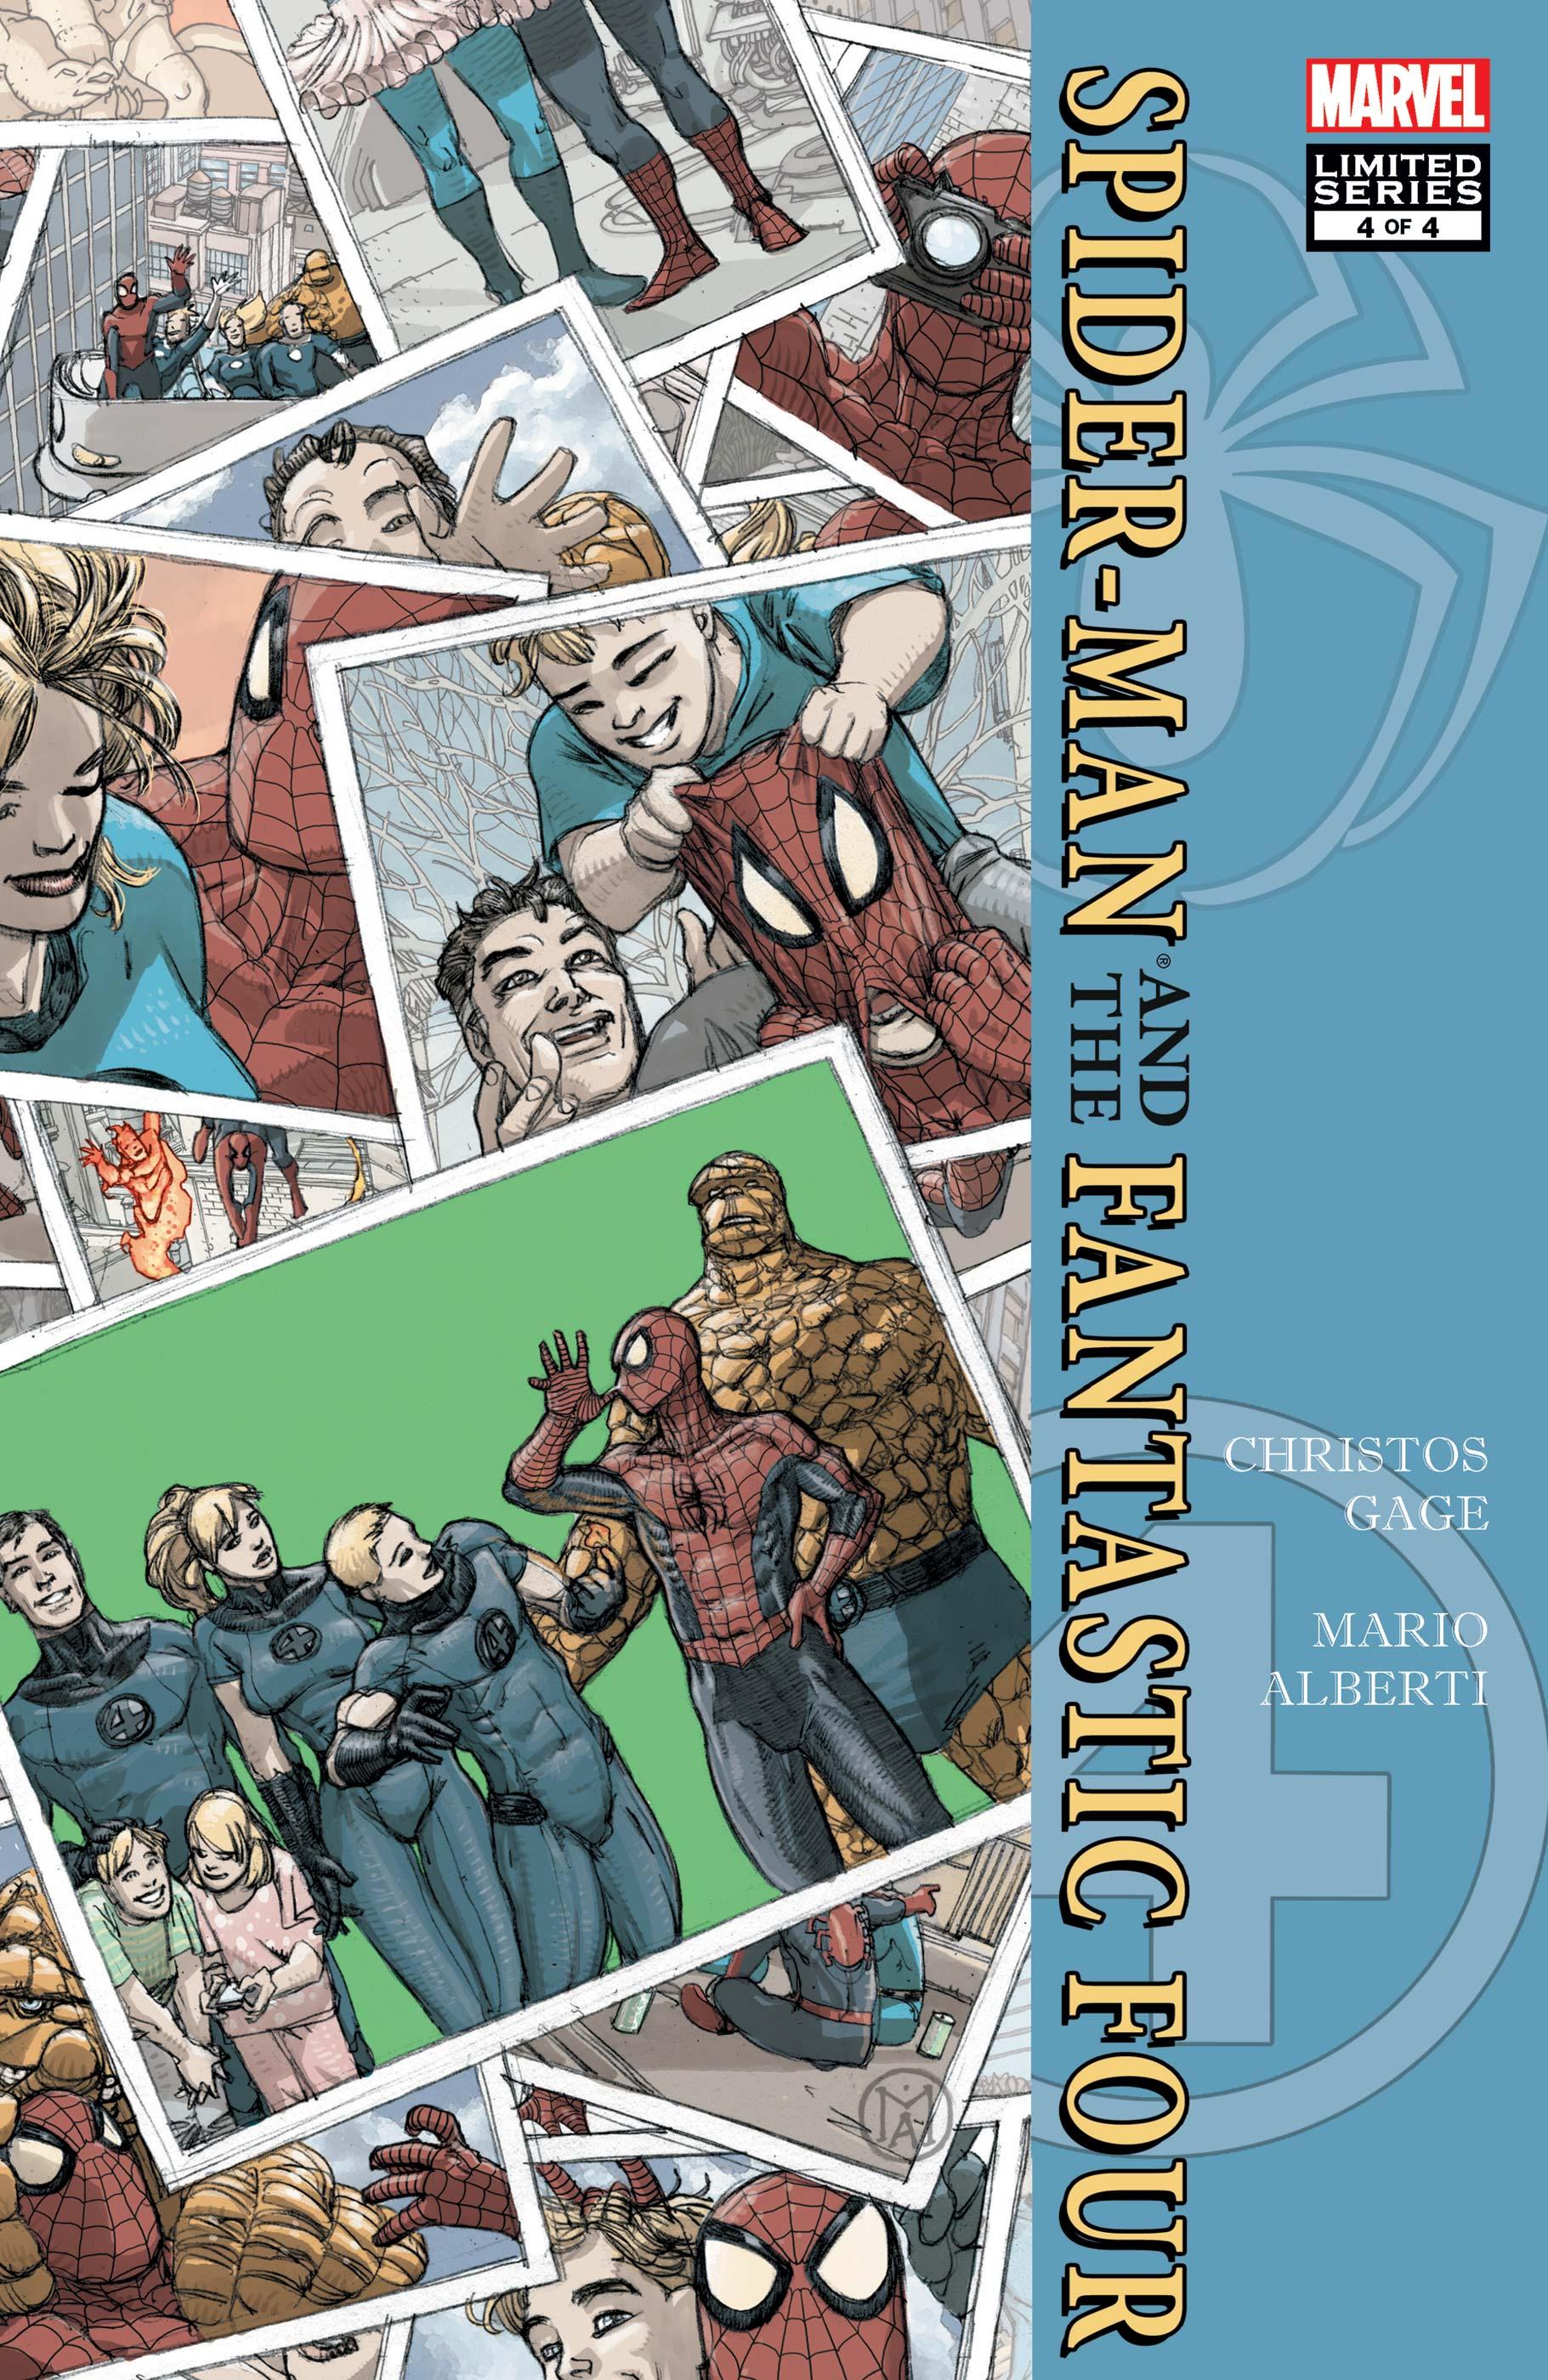 Spider-Man/Fantastic Four (2010) #4